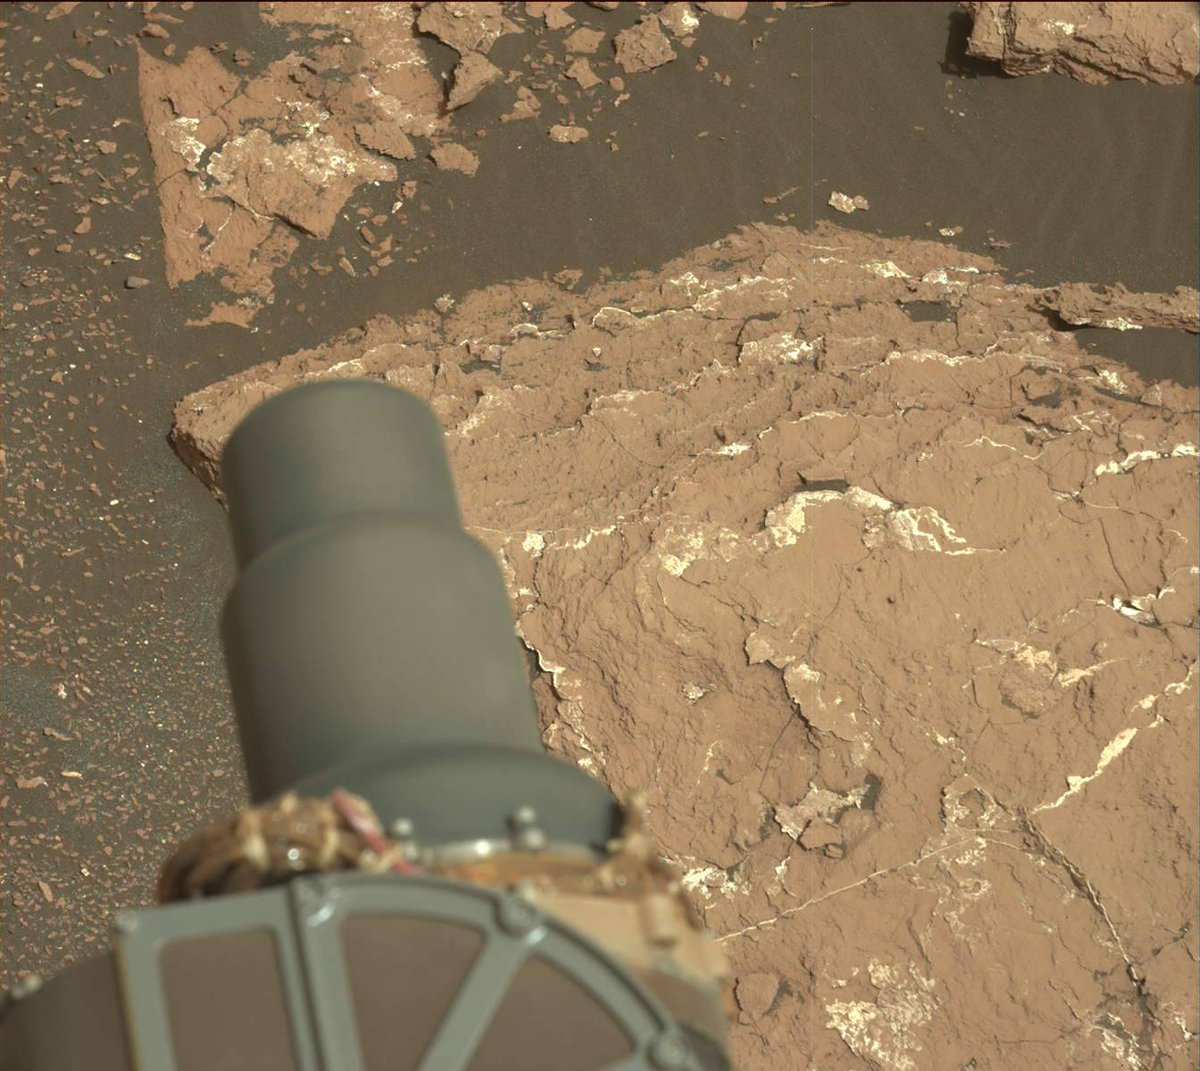 mars rover twitter - photo #8